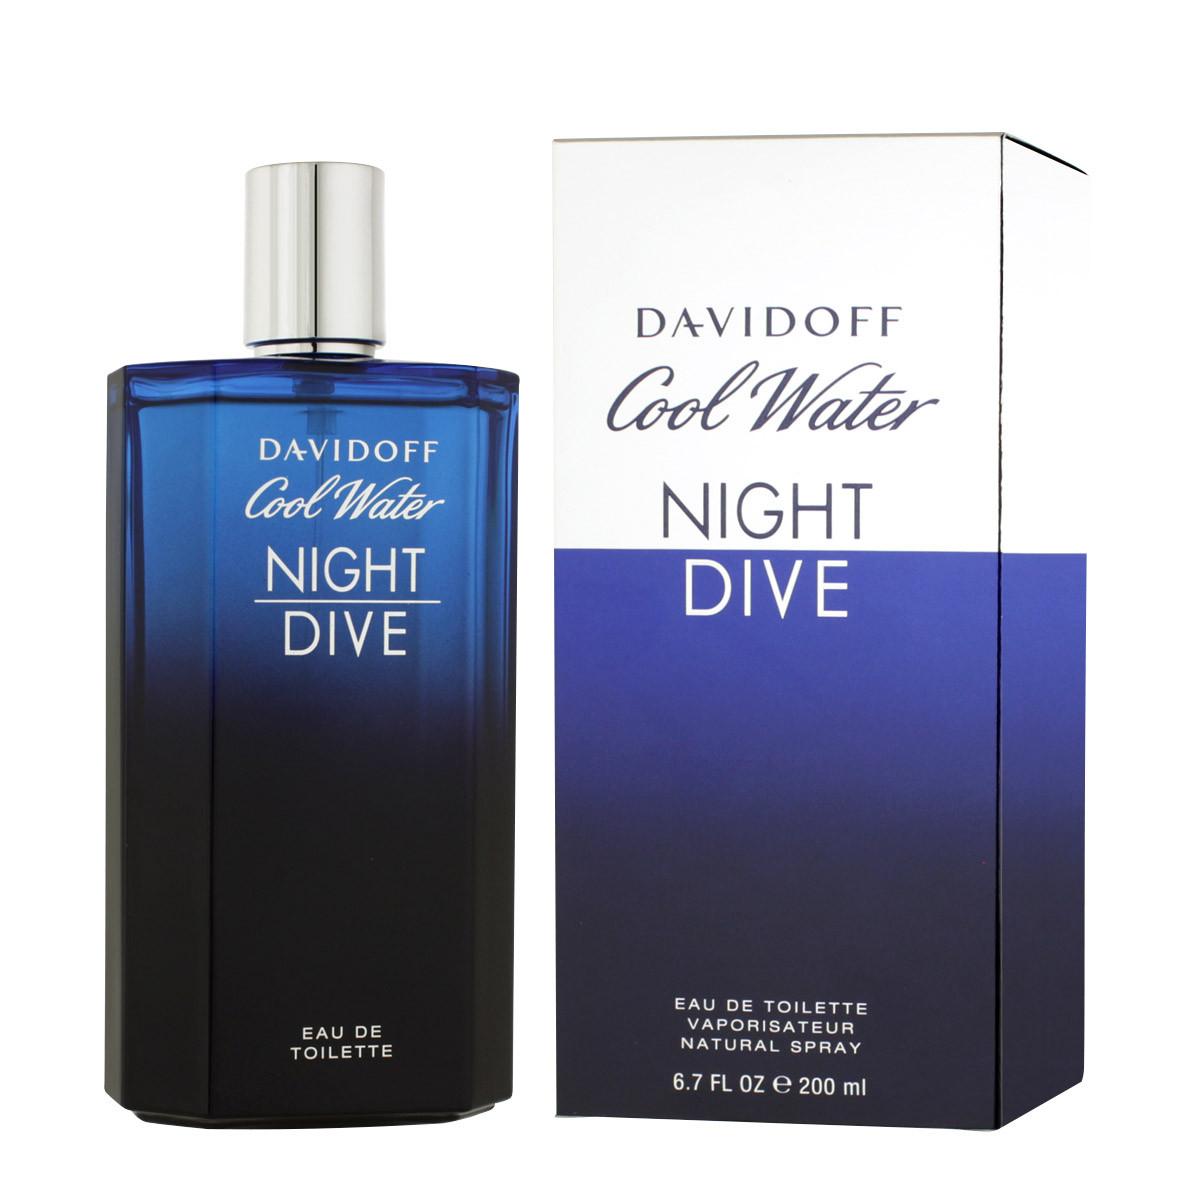 Davidoff Cool Water Night Dive Eau De Toilette 200 ml (man)